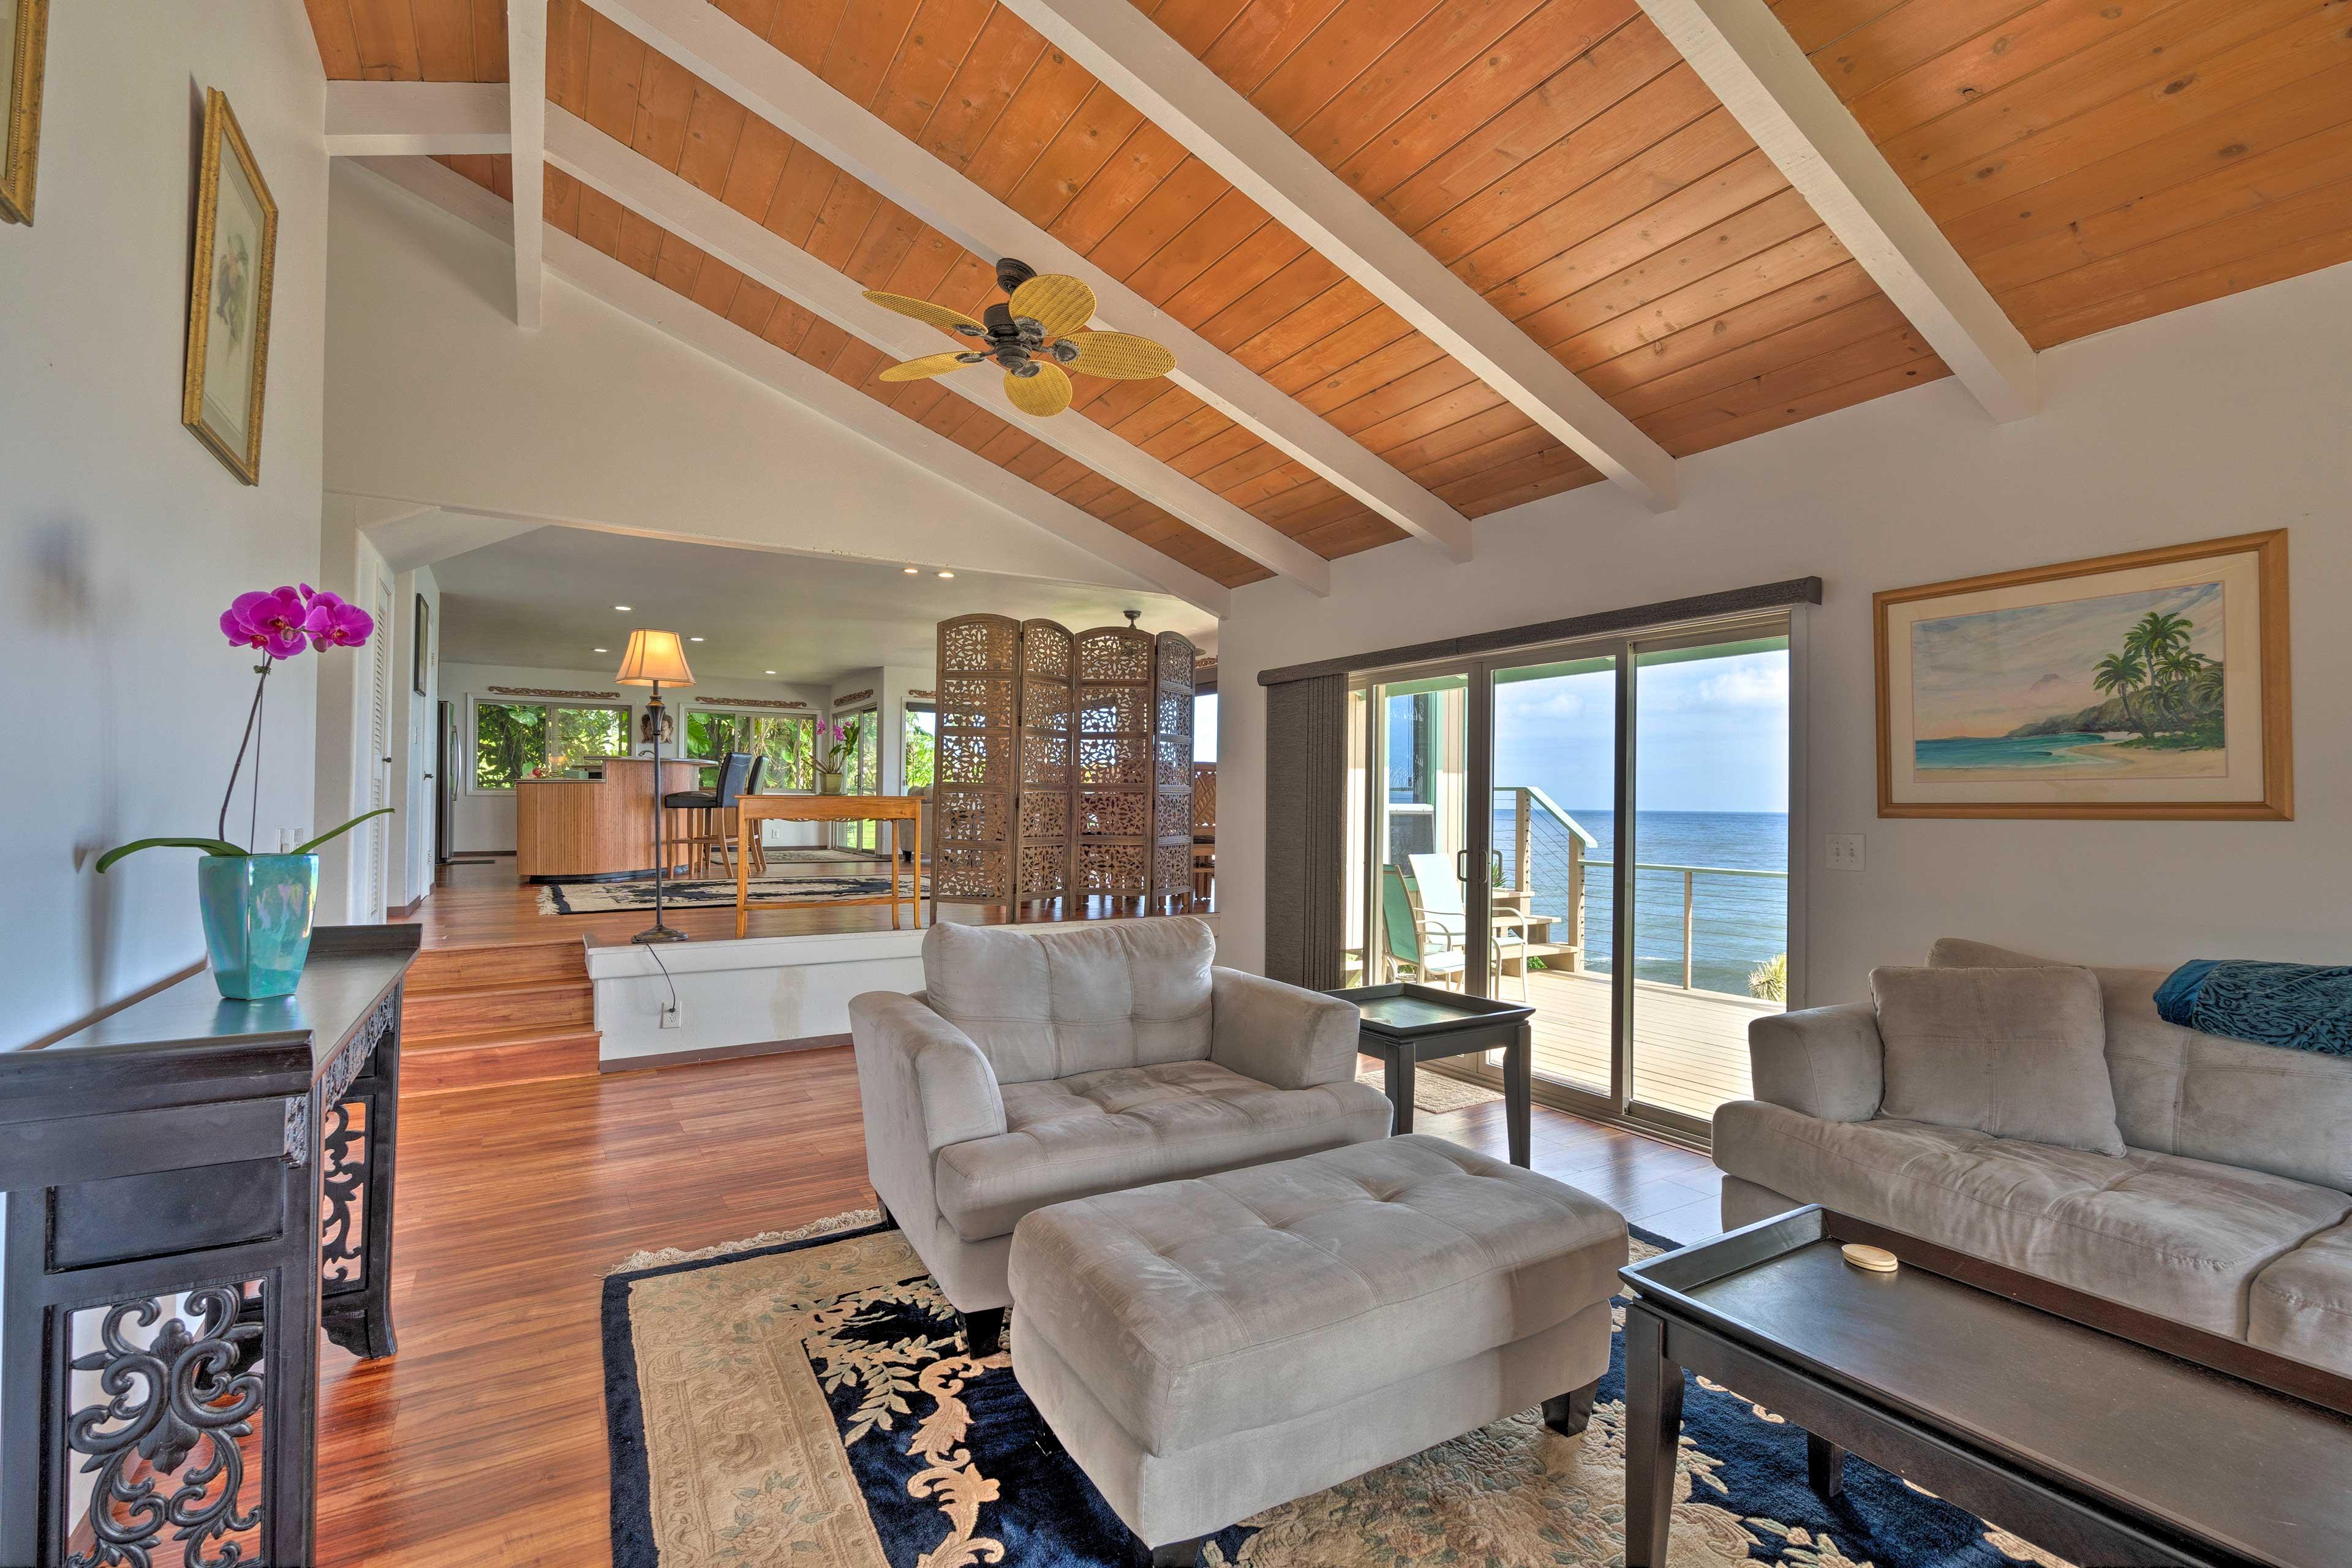 Open the sliding glass door to feel the ocean breeze flow through the space.